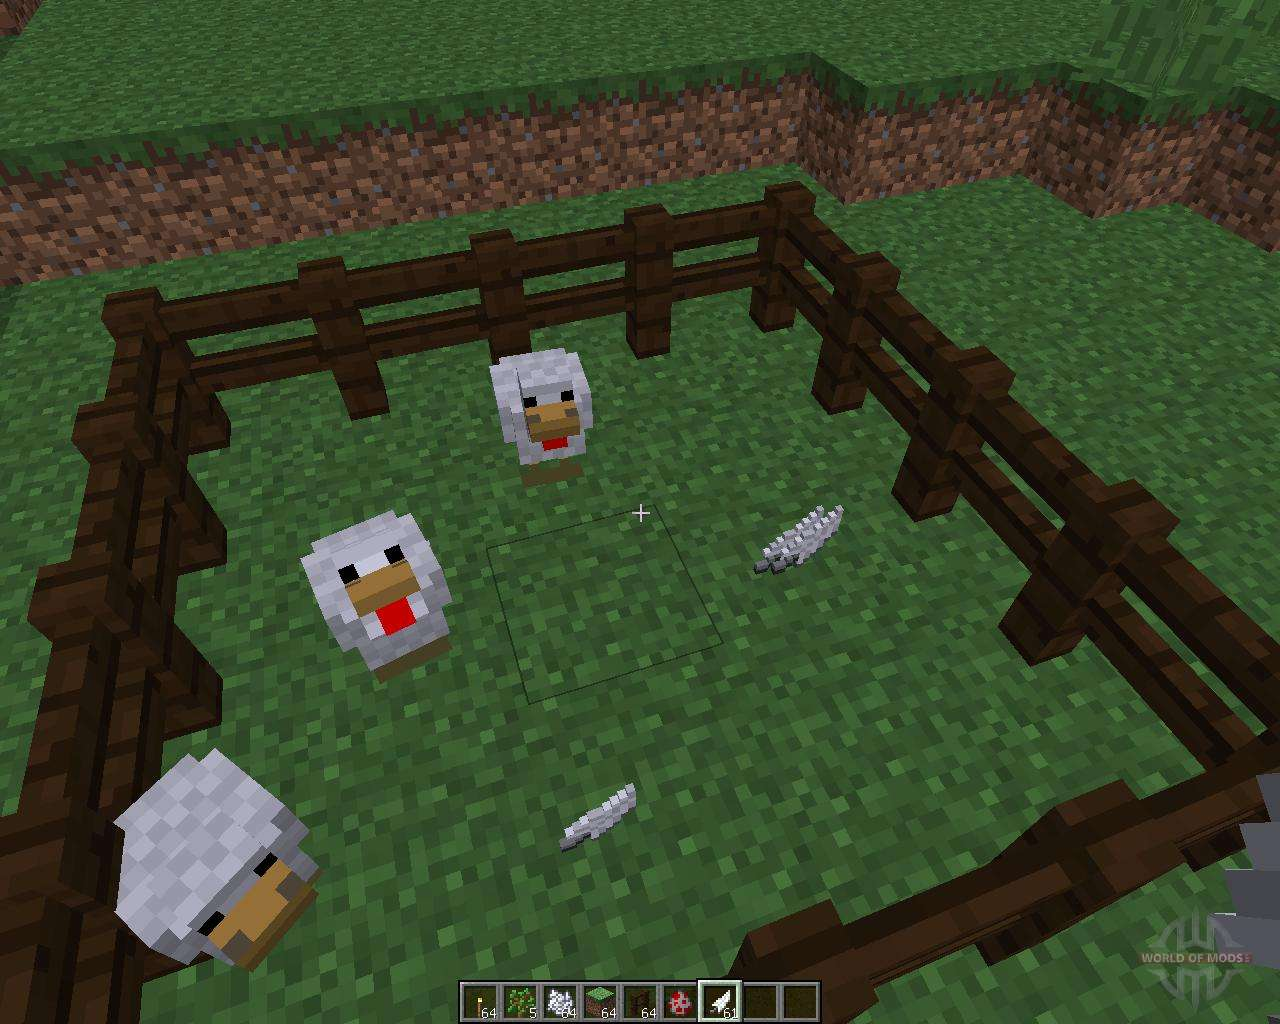 мод на chickenshed для майнкрафт 1.8 #1